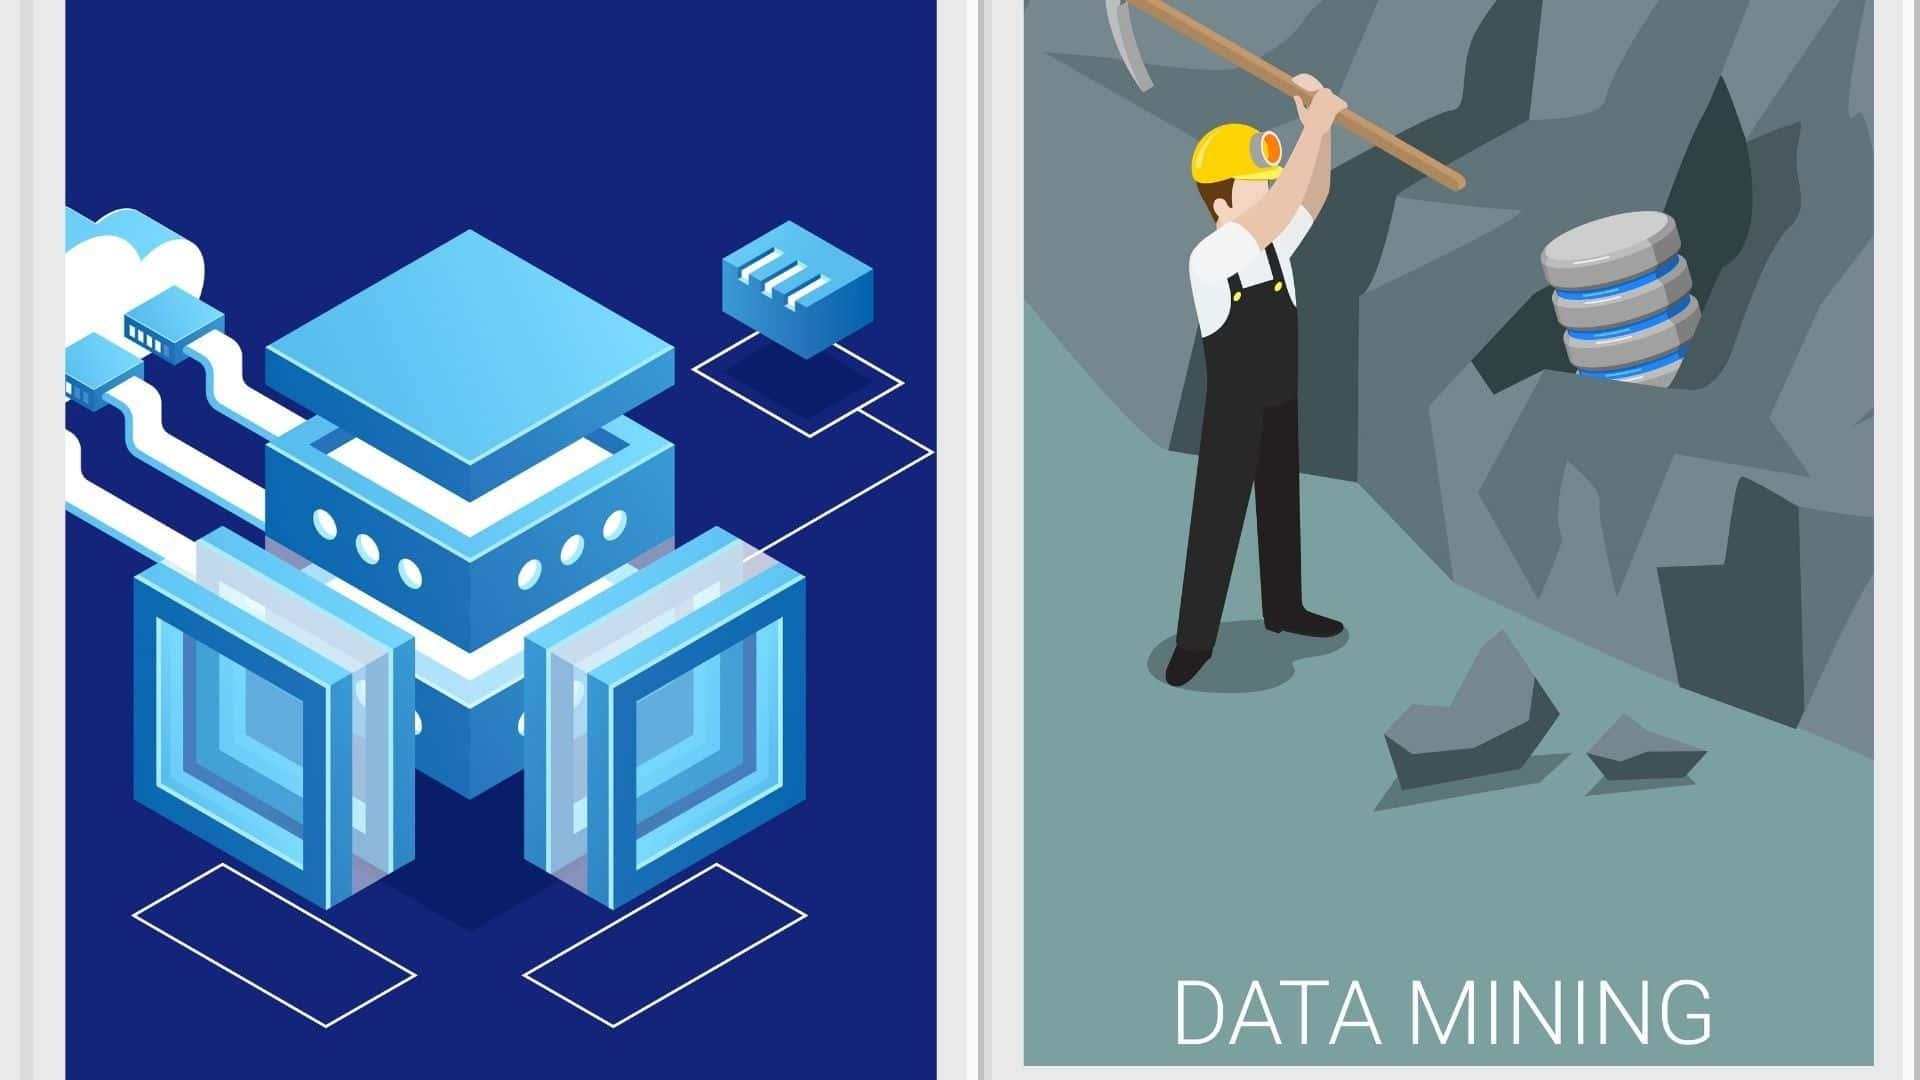 Data Warehousing vs. Data Mining - Key Differences